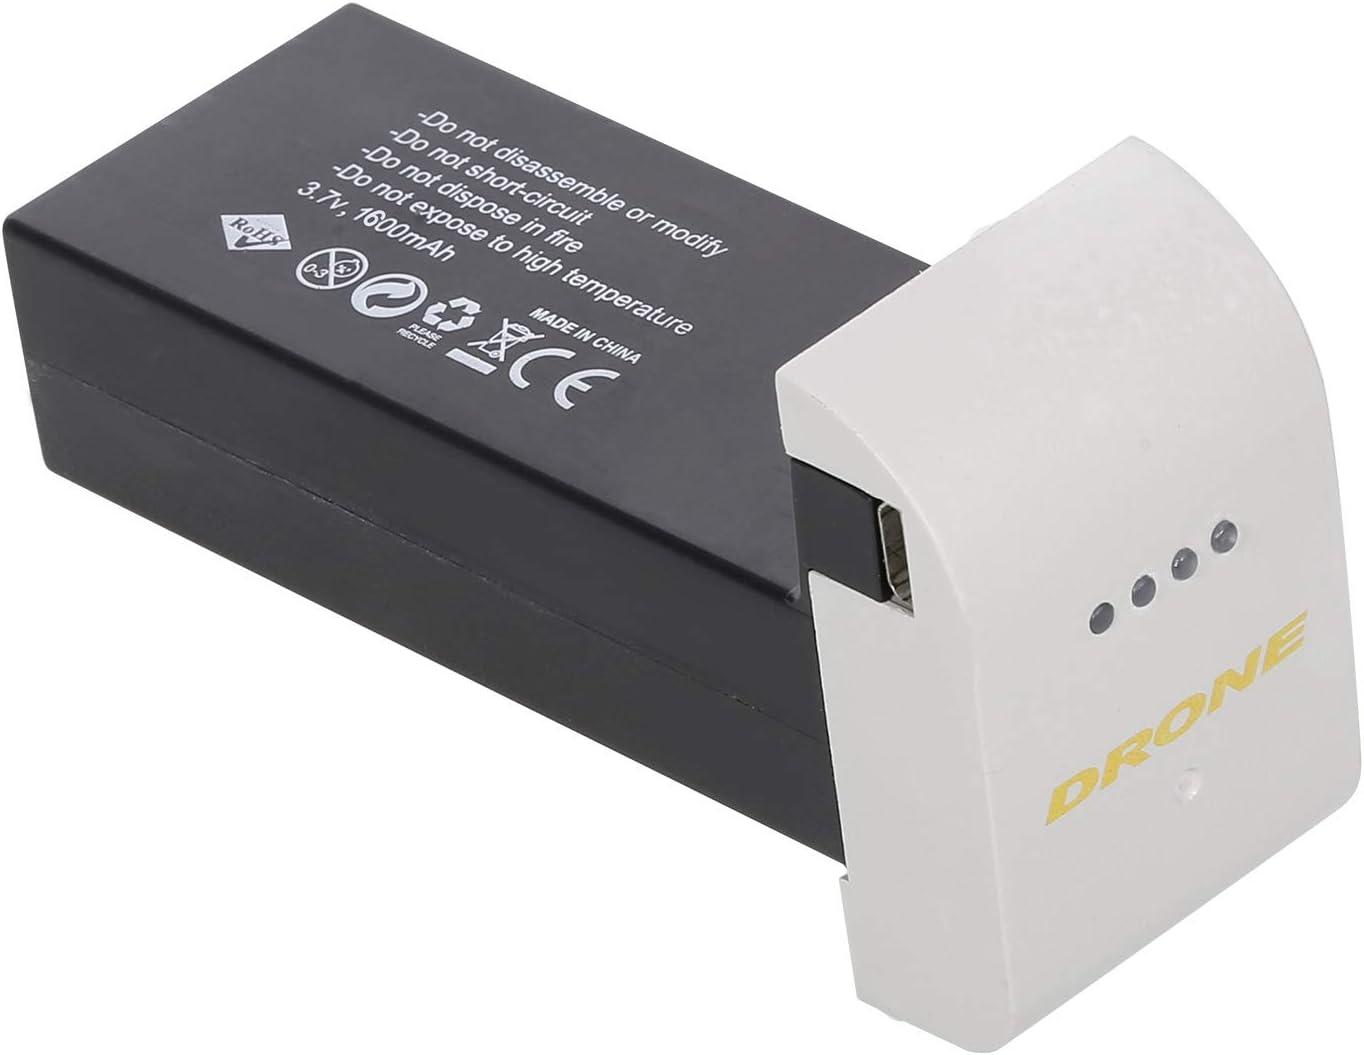 5Pcs 3.7V 1600mAh Lipo Battery High Capacity For Drone RC Quadcopter Parts